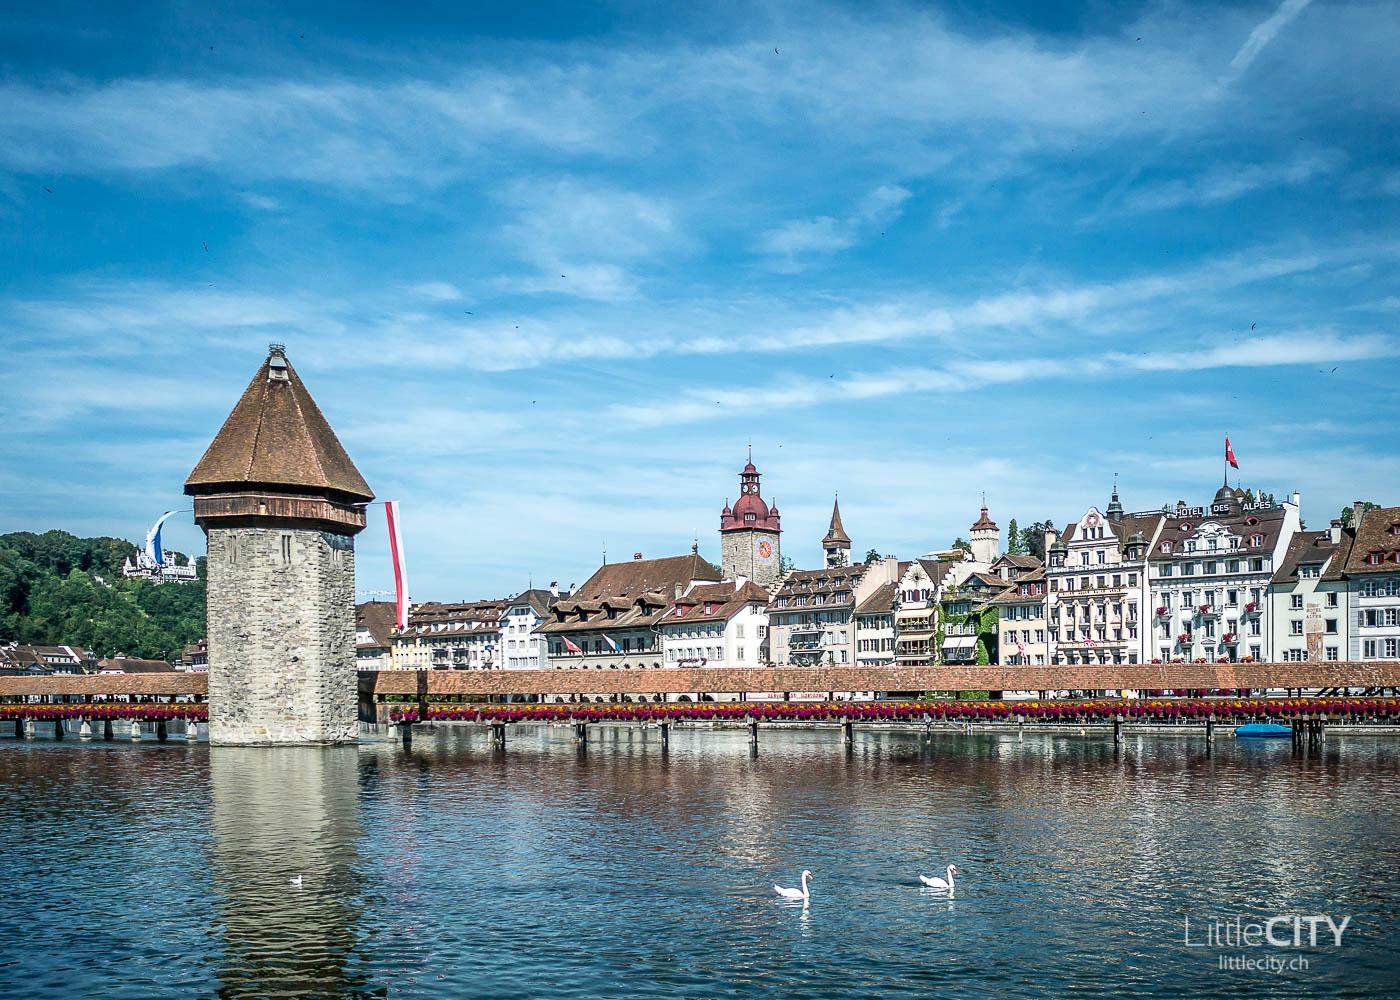 Luzern Kappelbrücke Sommer-1-4